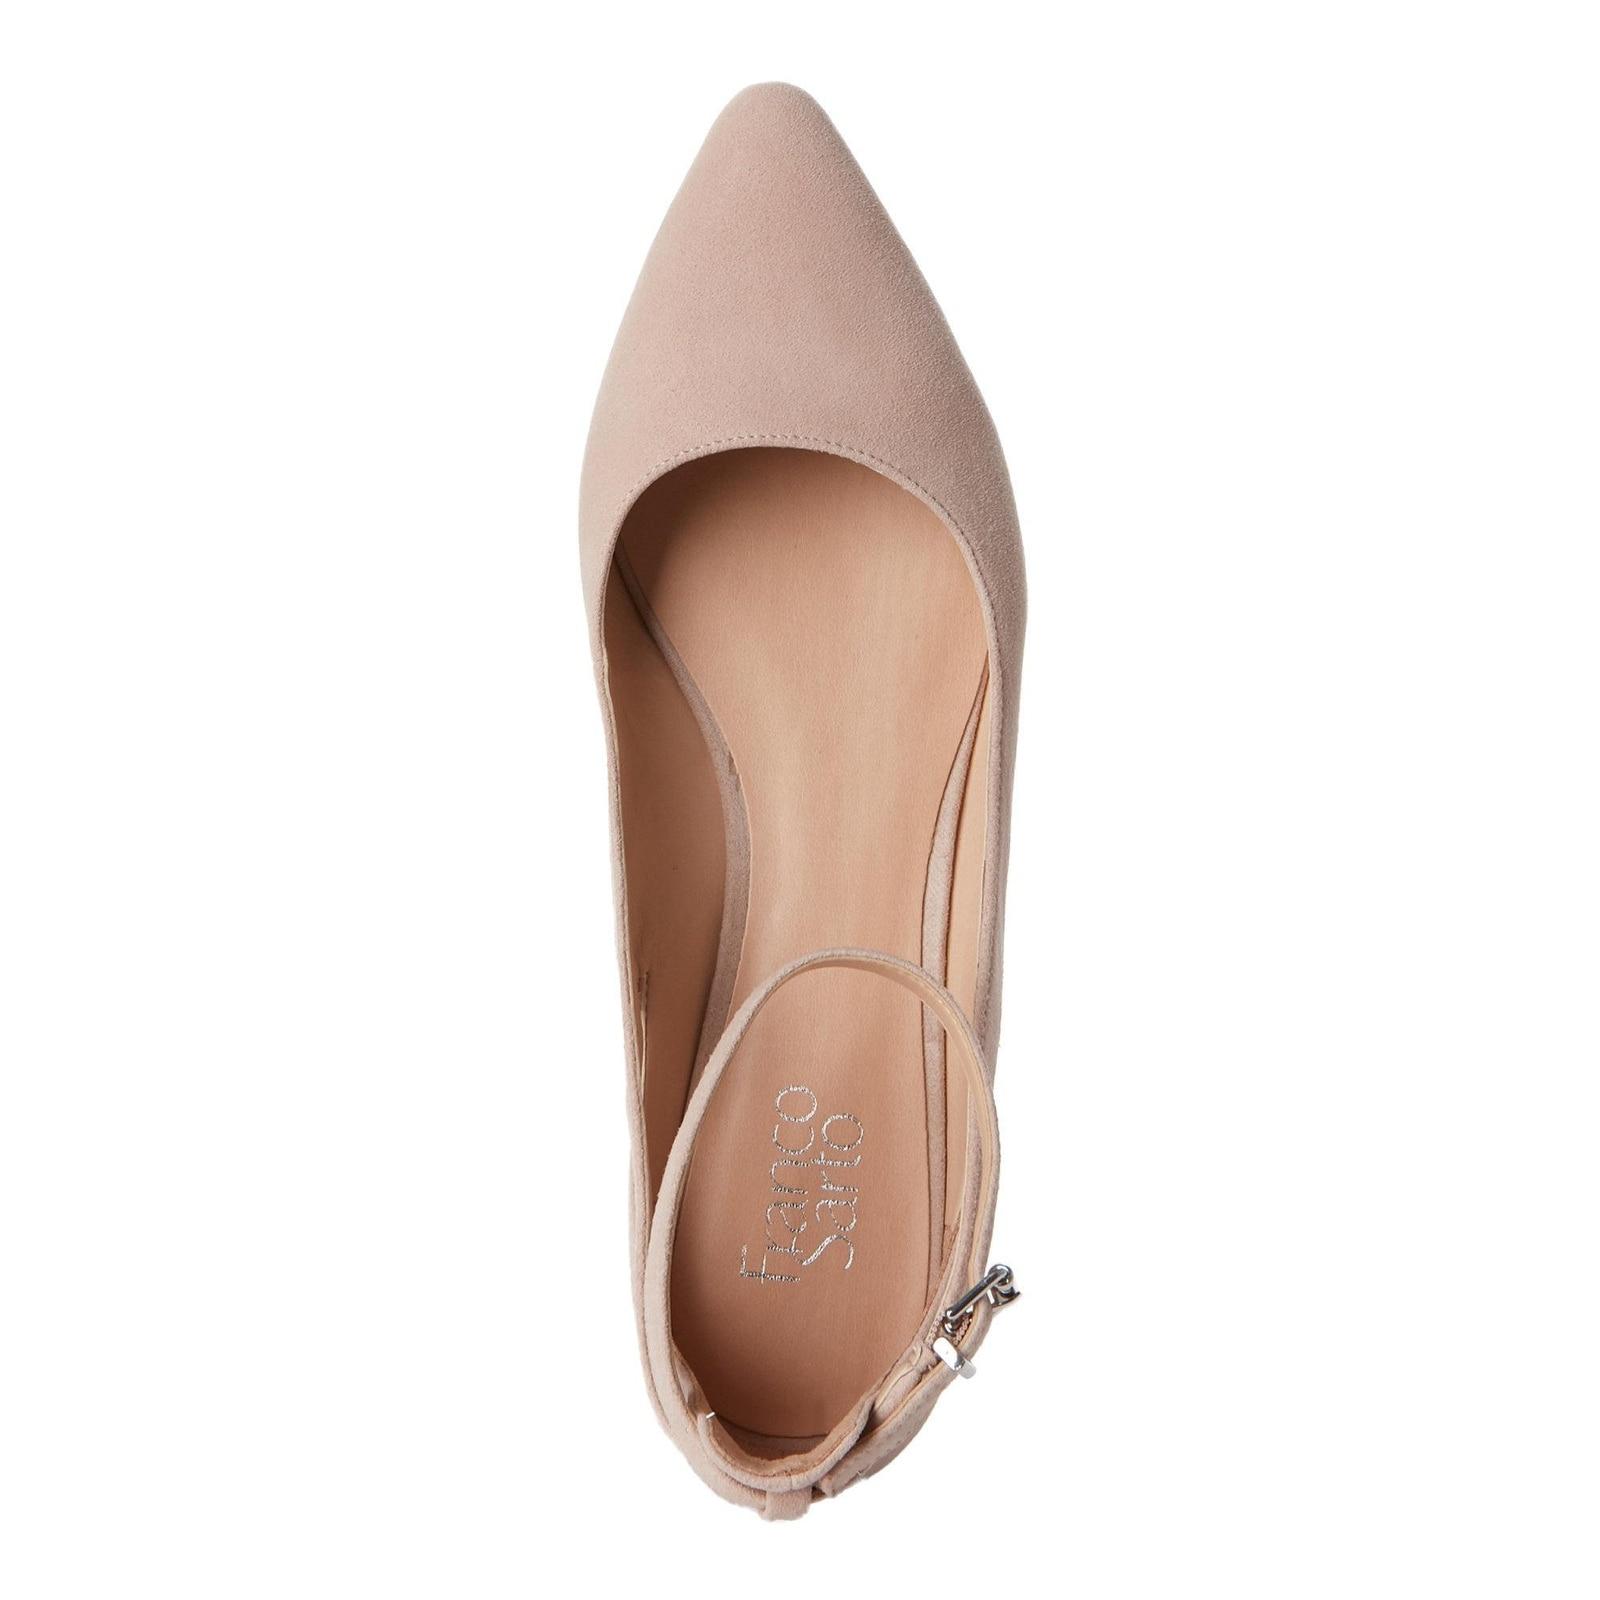 64415390855 Franco Sarto Womens sylvia Pointed Toe Ankle Strap Espadrille Flats